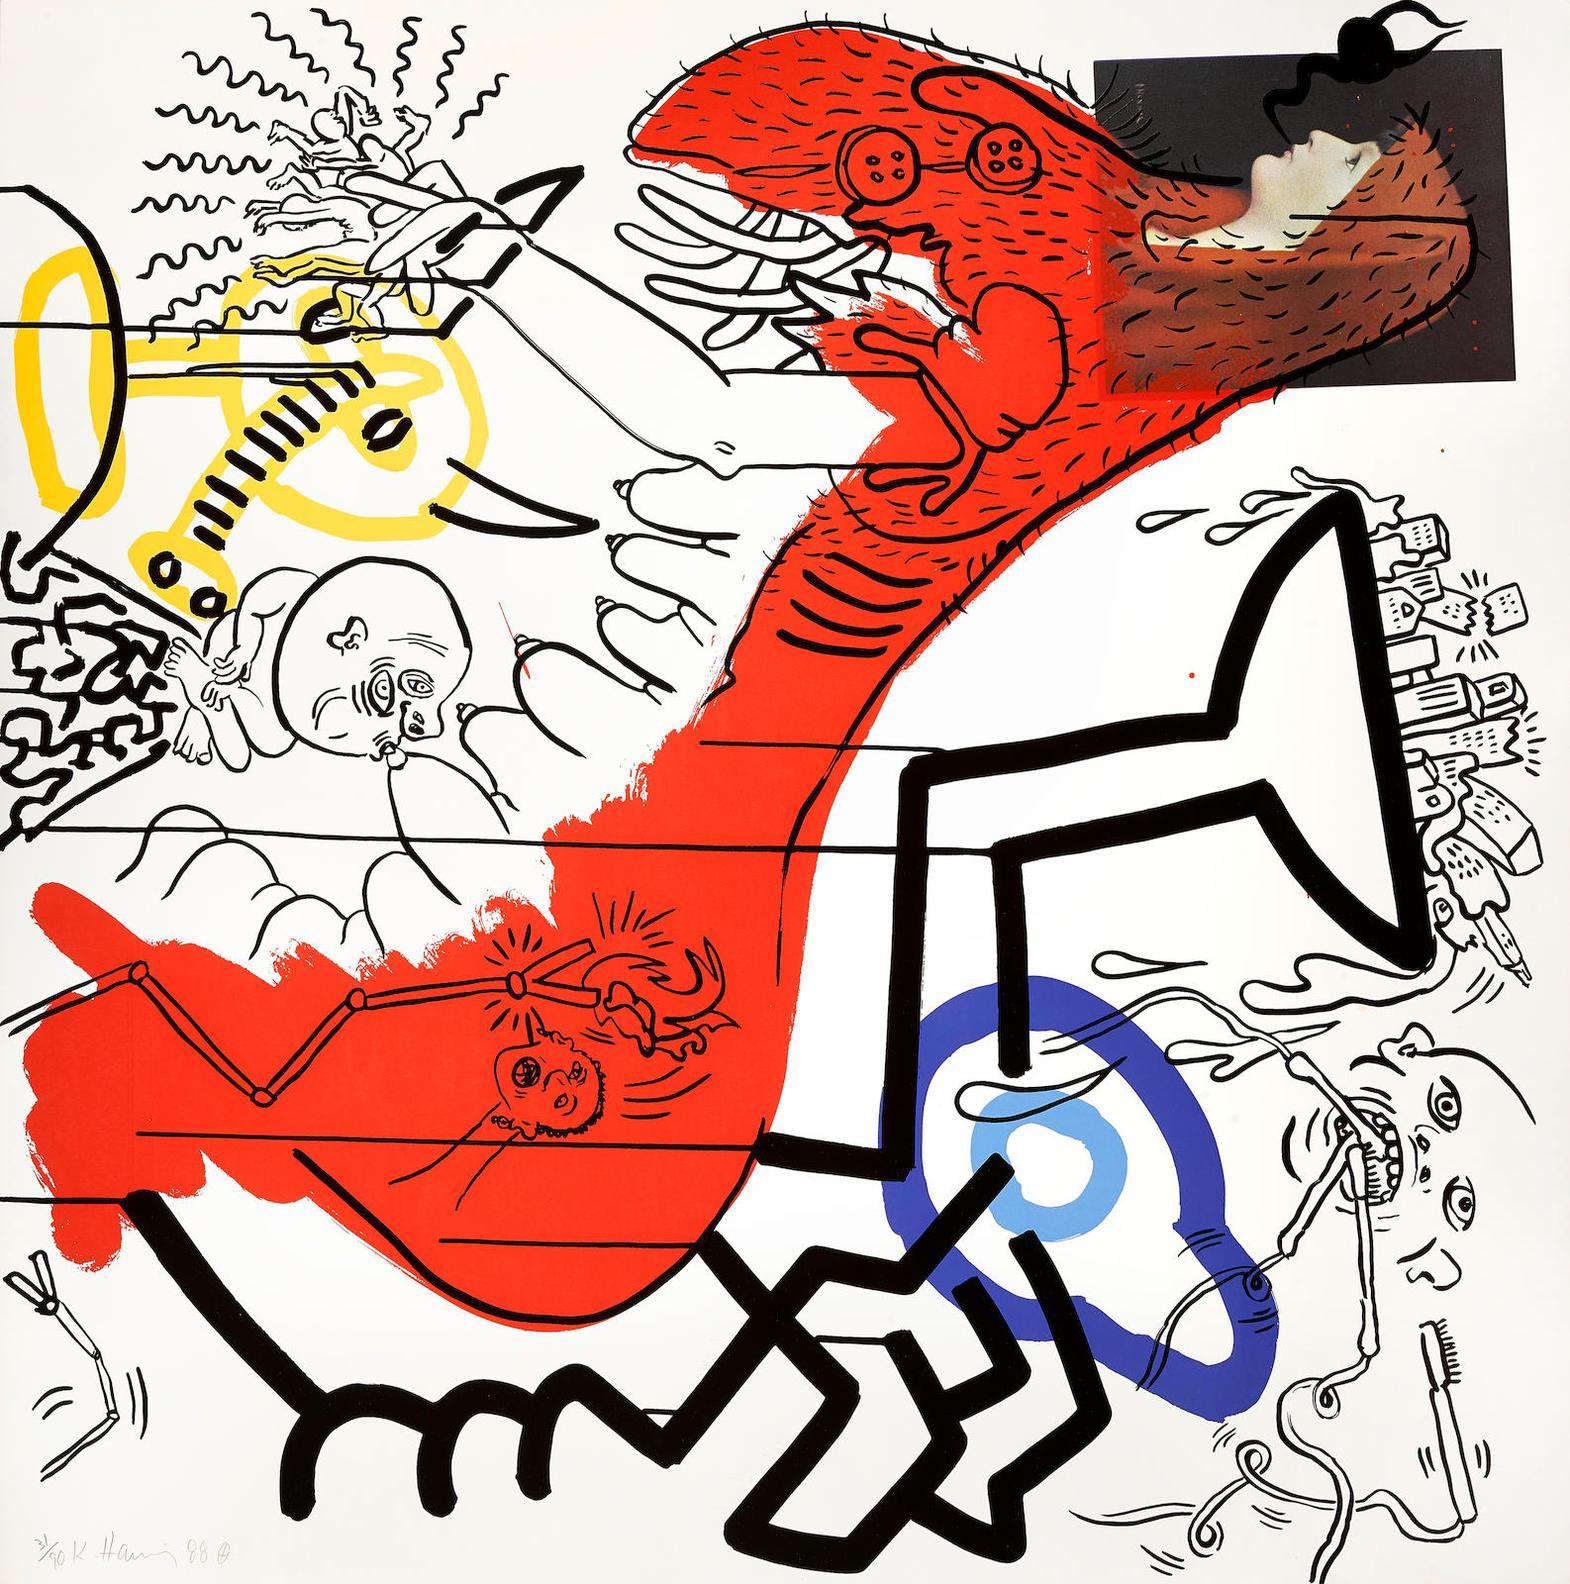 Keith Haring-Apocalypse #4 (L. P.102)-1988